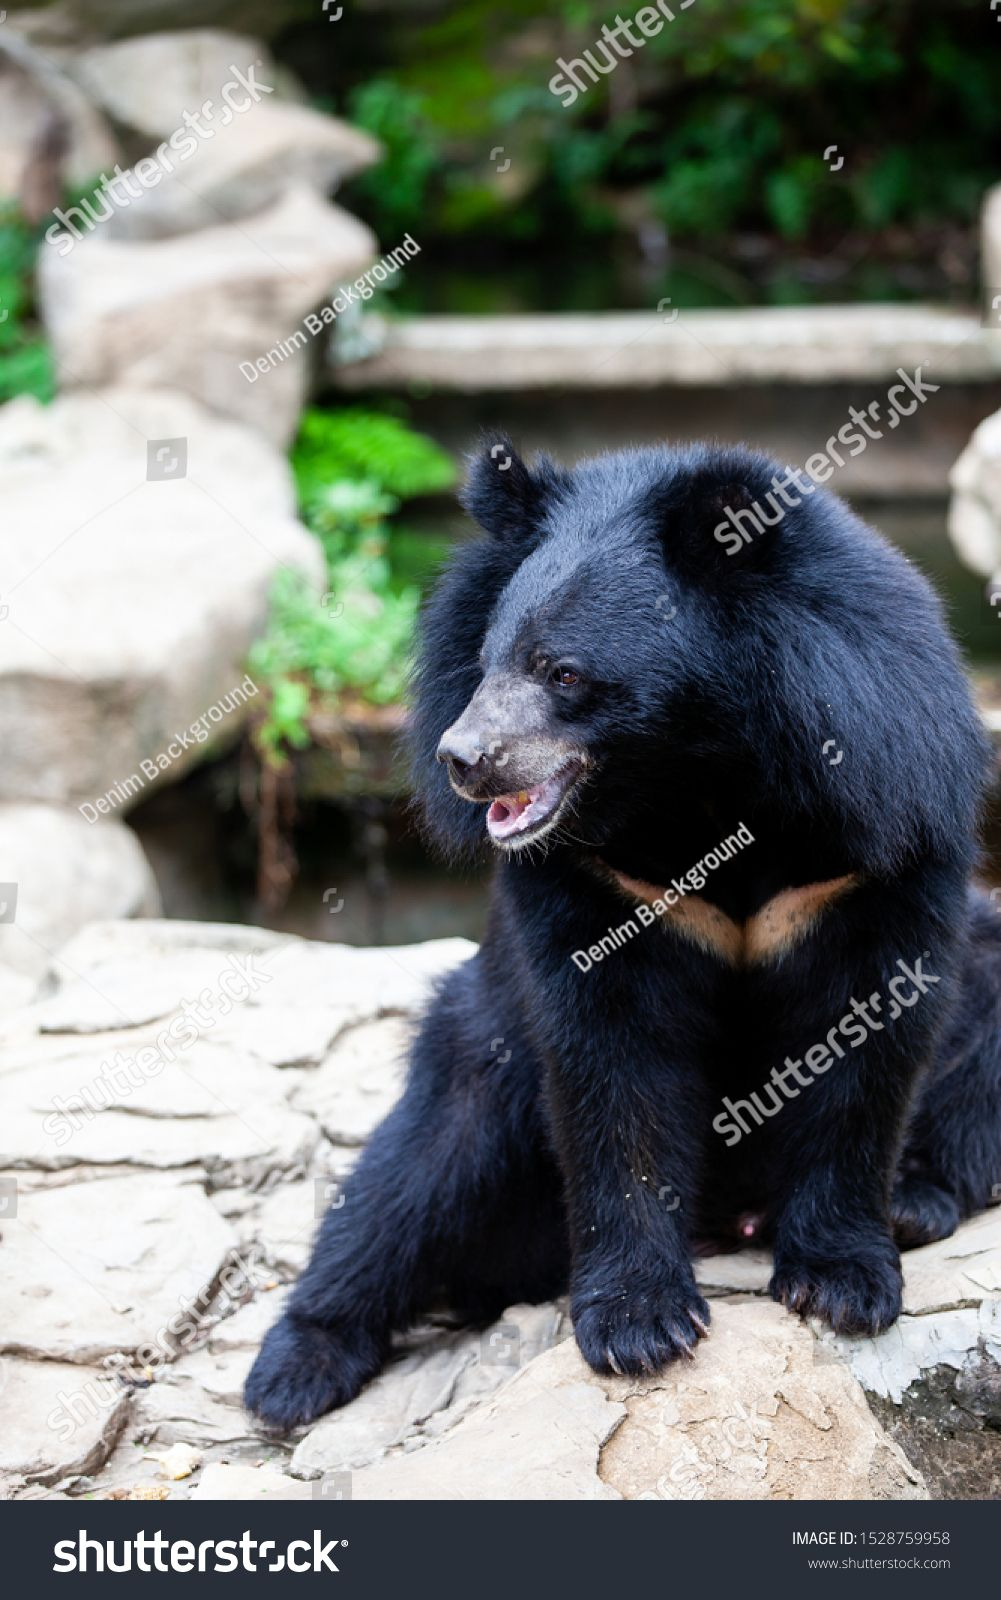 Asian Great Black Bear Danger Mammal Image Photo Black Bear Bear Mammals